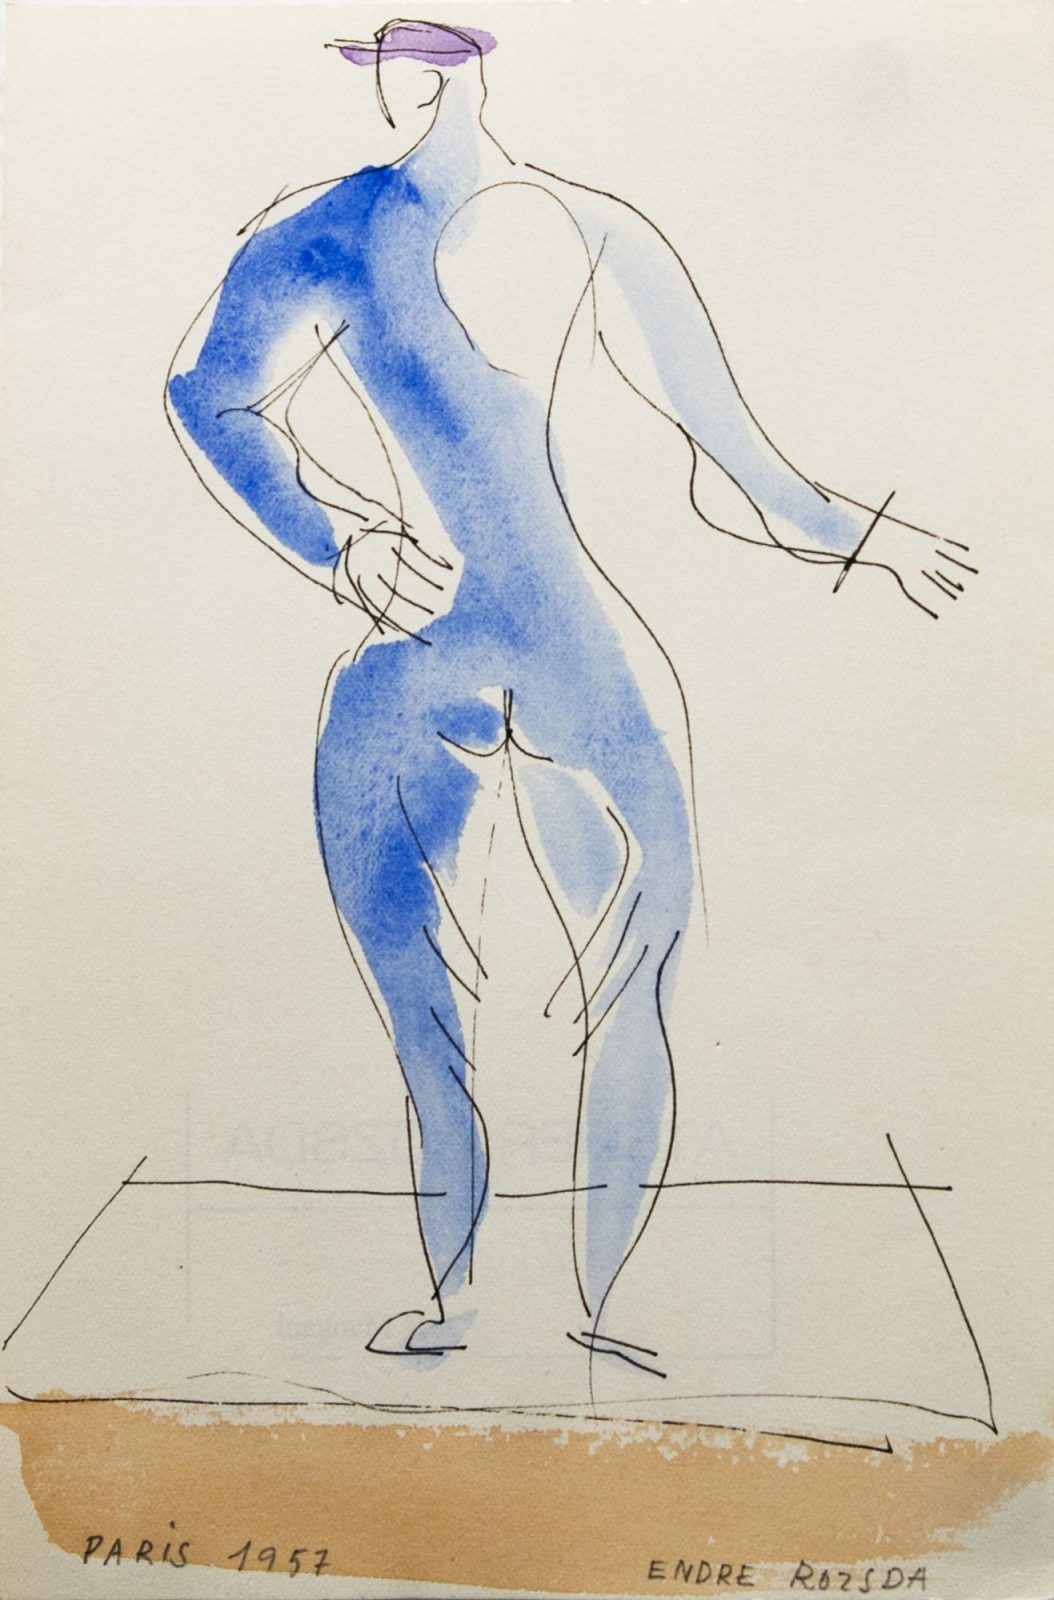 Endre Rozsda: Watercolour II.